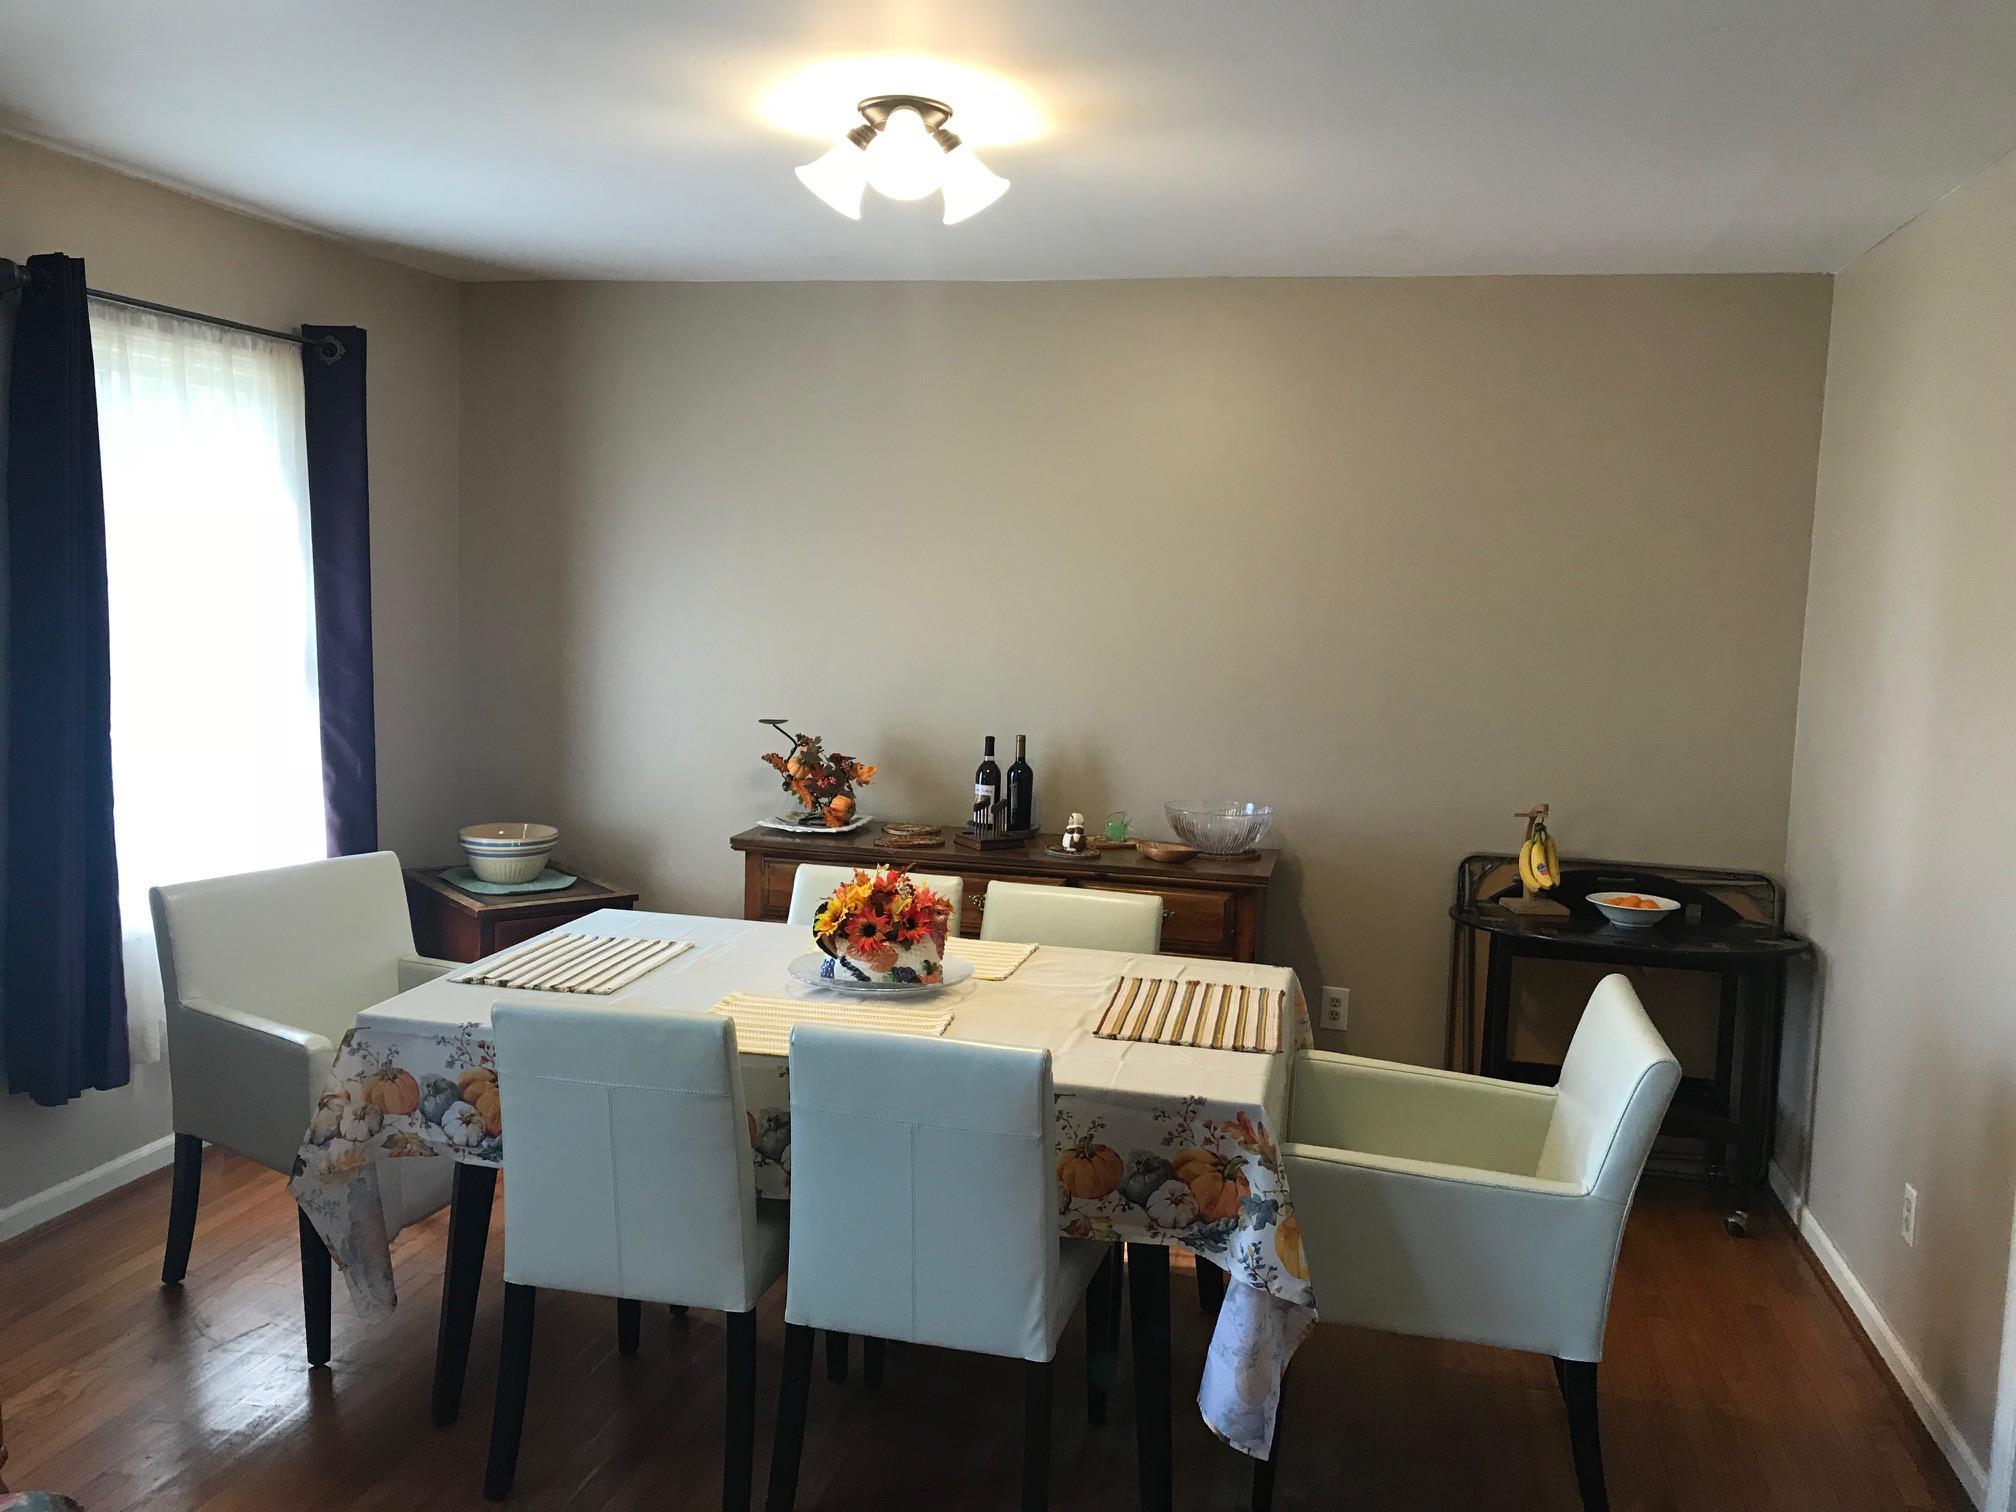 Northbridge Terrace Homes For Sale - 1079 Orange Grove, Charleston, SC - 26